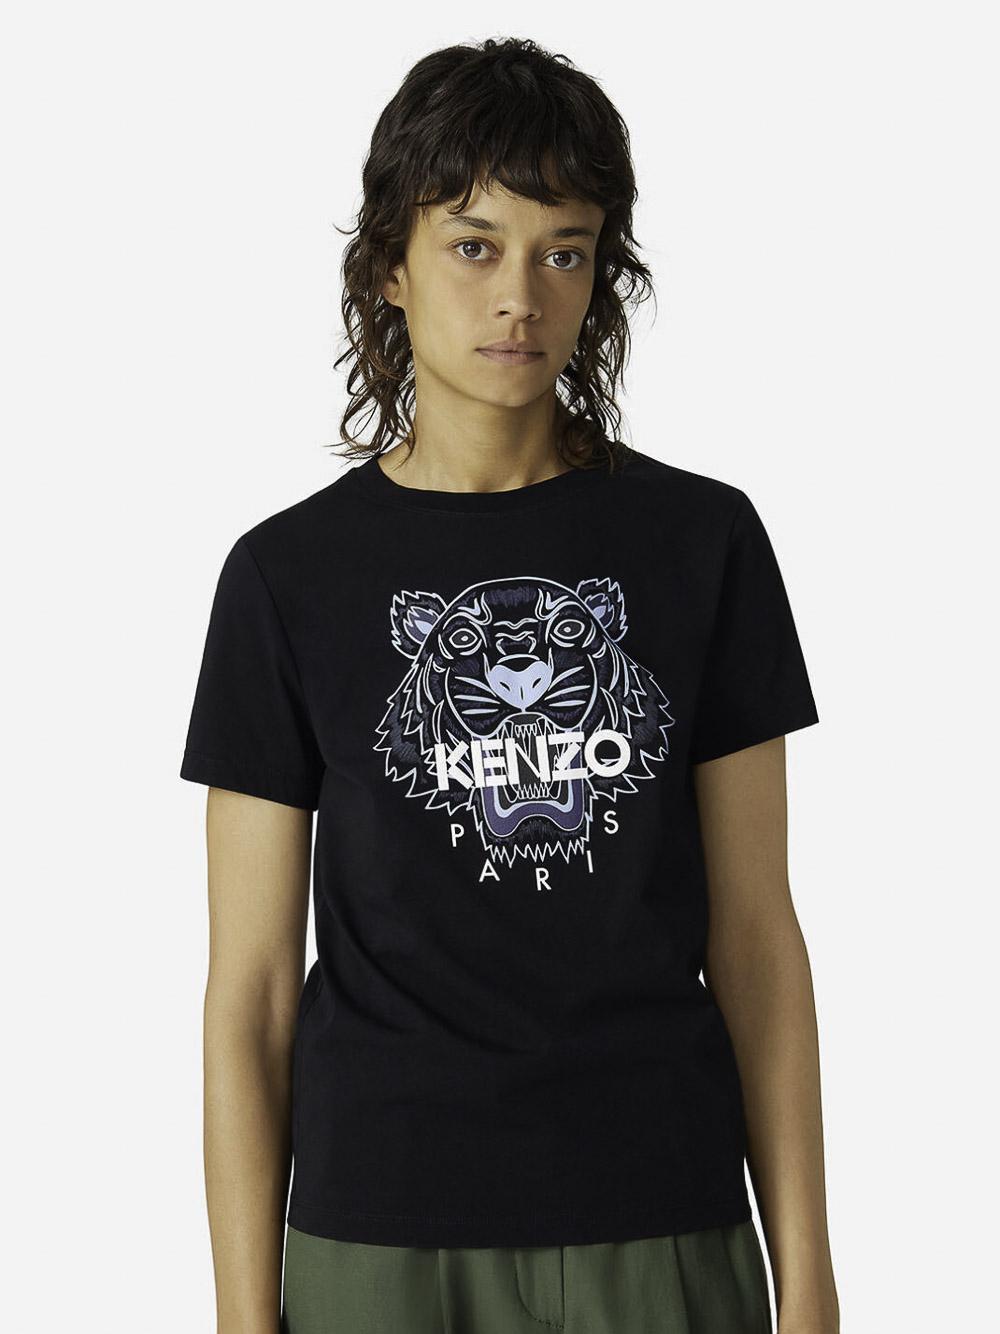 KENZO Μπλούζα t-shirt 2TS8484YB-99 ΜΑΥΡΟ